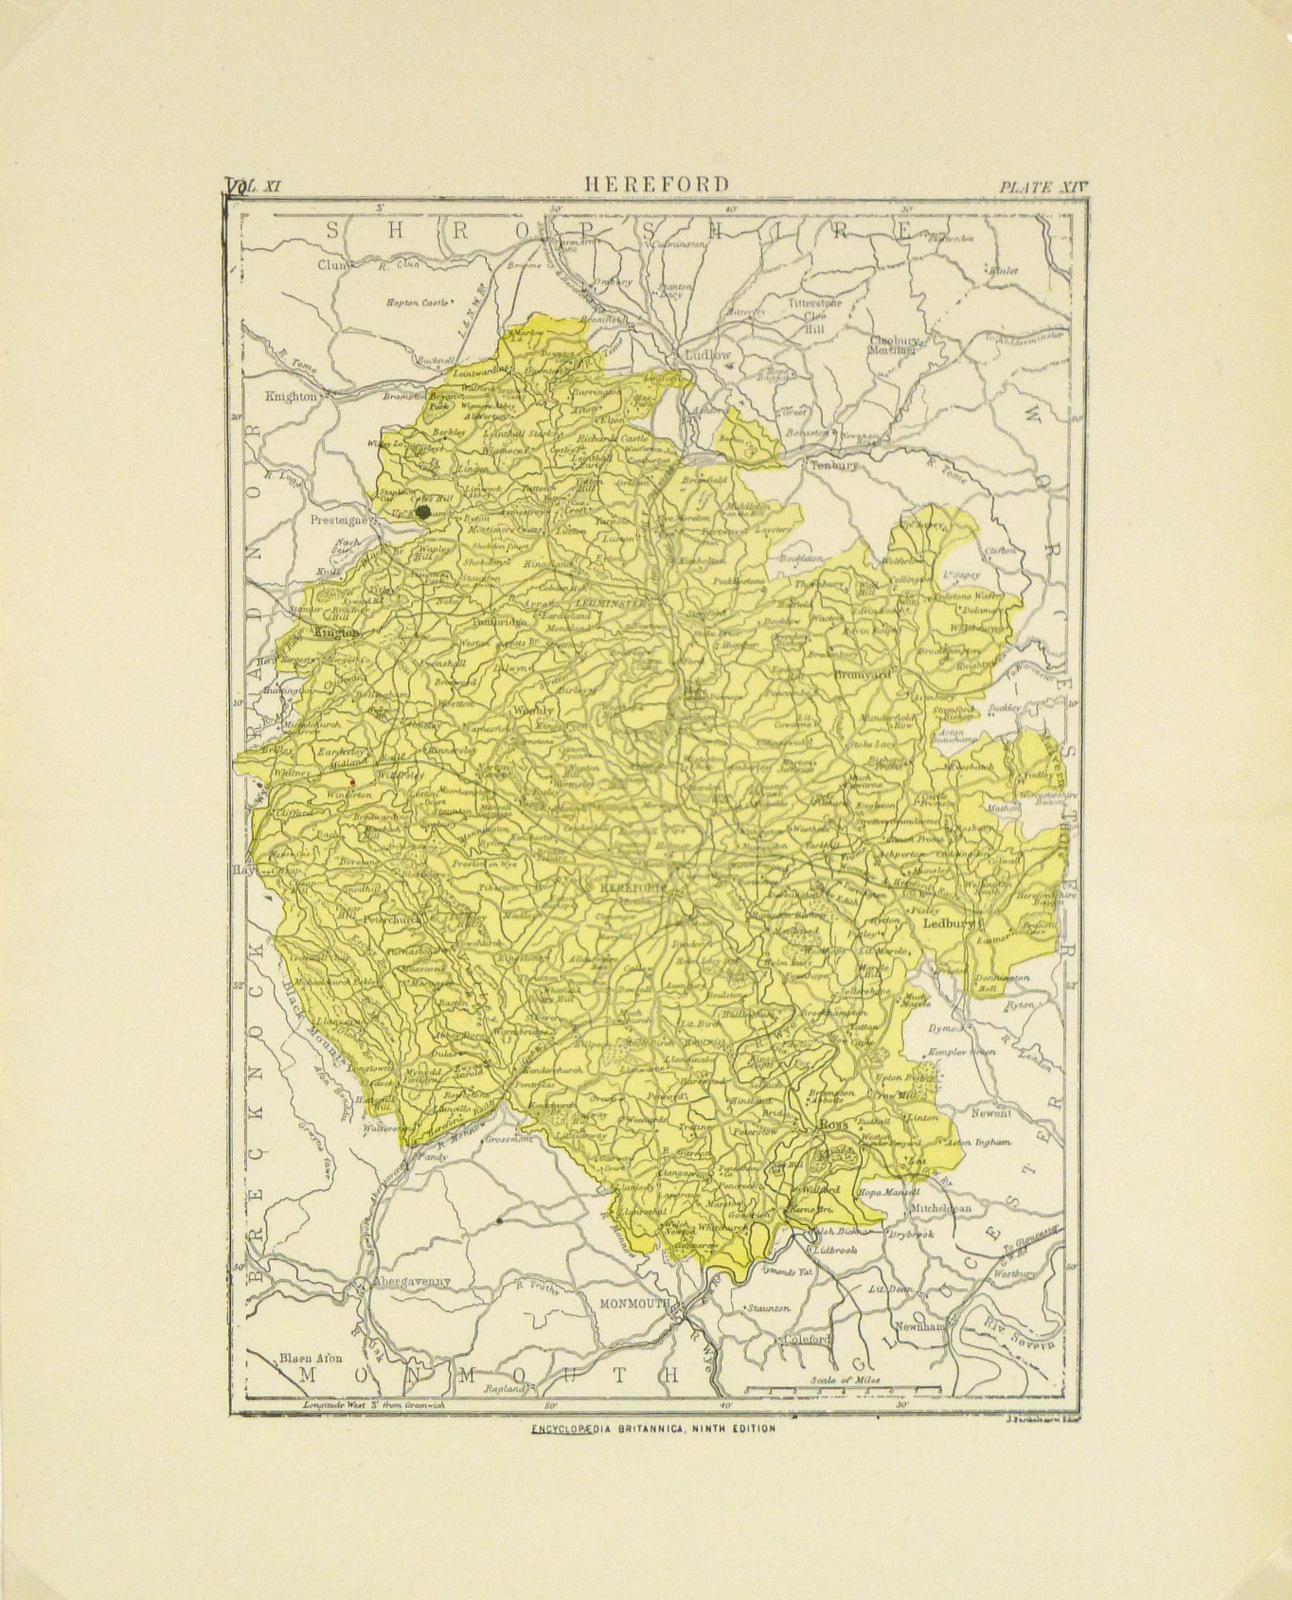 Hereford, England Map, Circa 1880-main-8188K